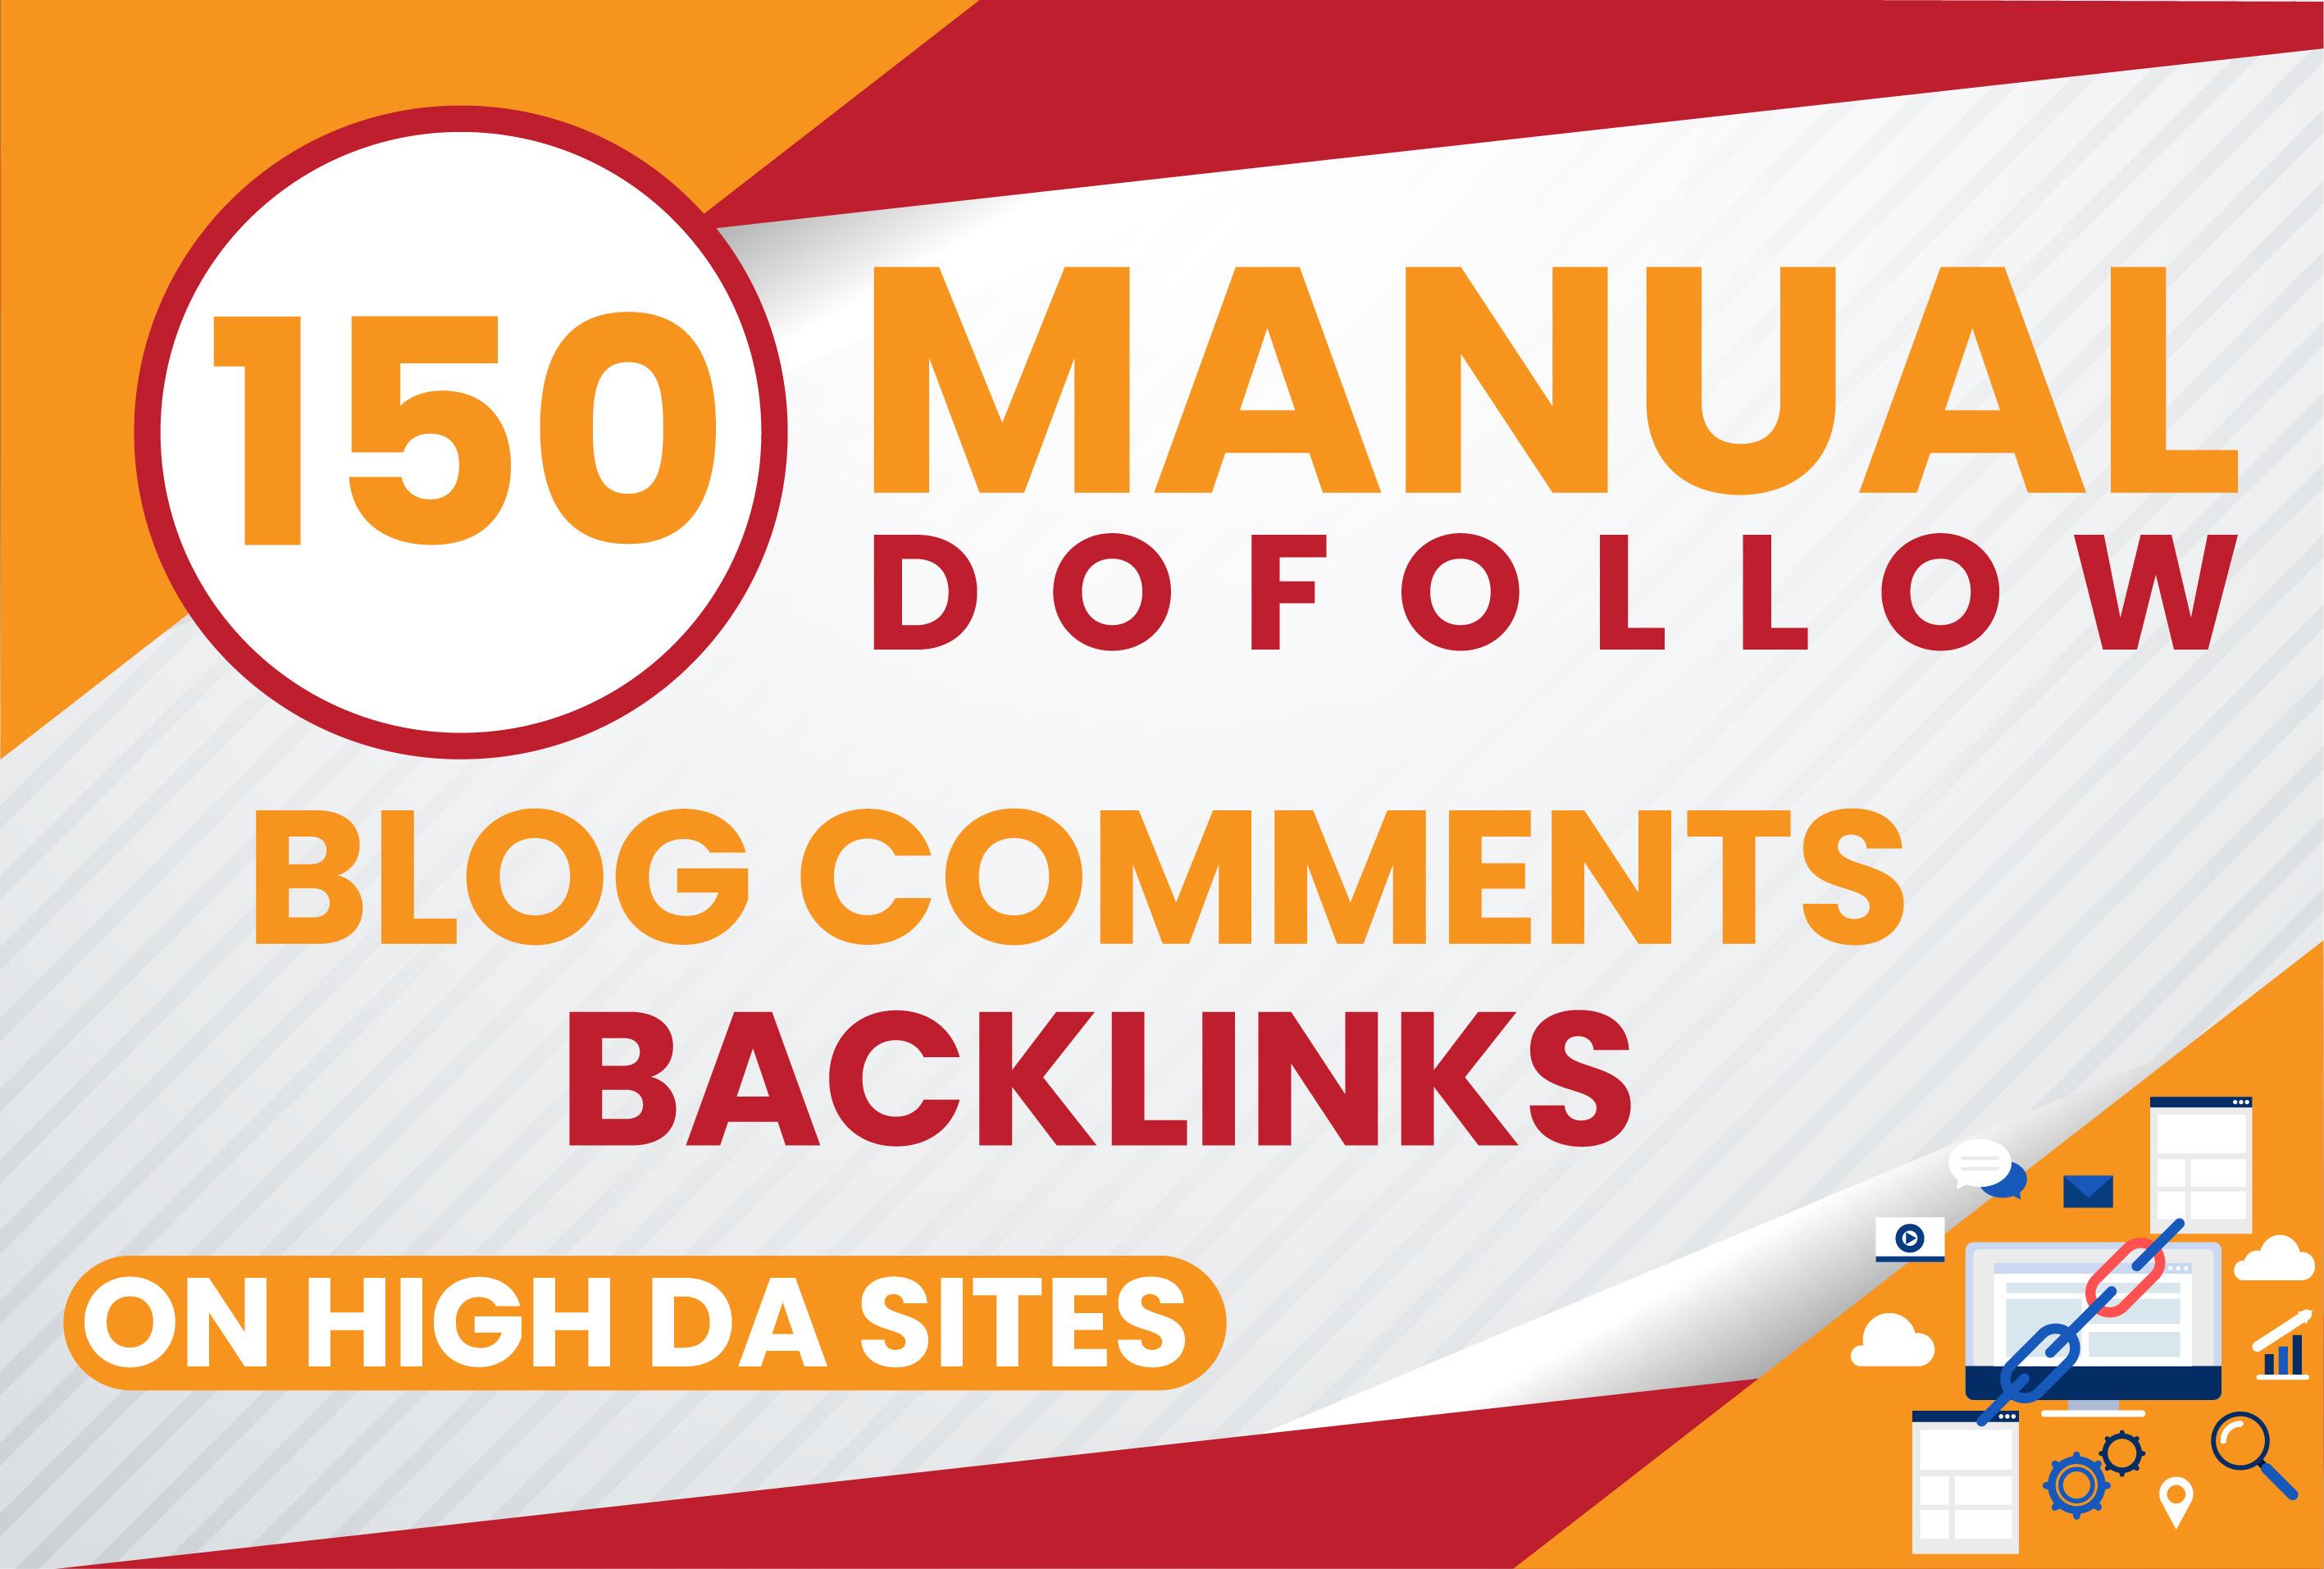 Get 150 MANUAL Dofollow Blog comments Backlinks on High DA Sites